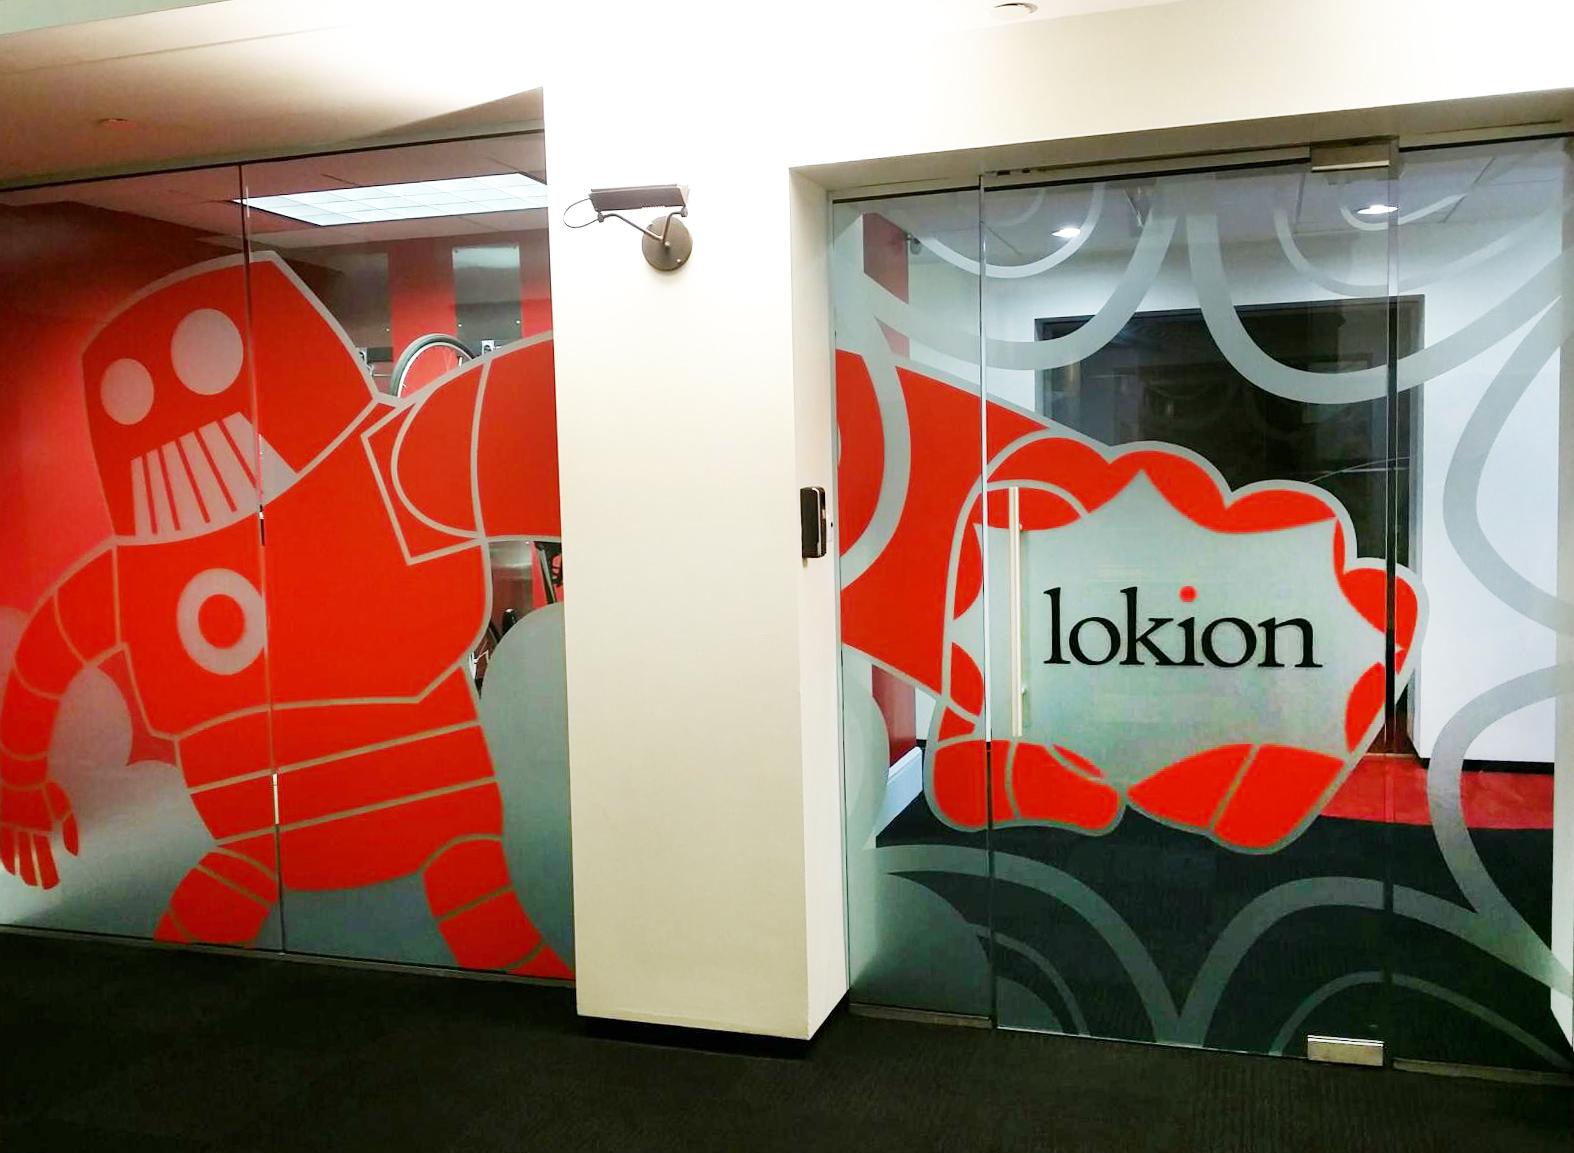 Lokion Etched Glass w/ Vinyl Graphics